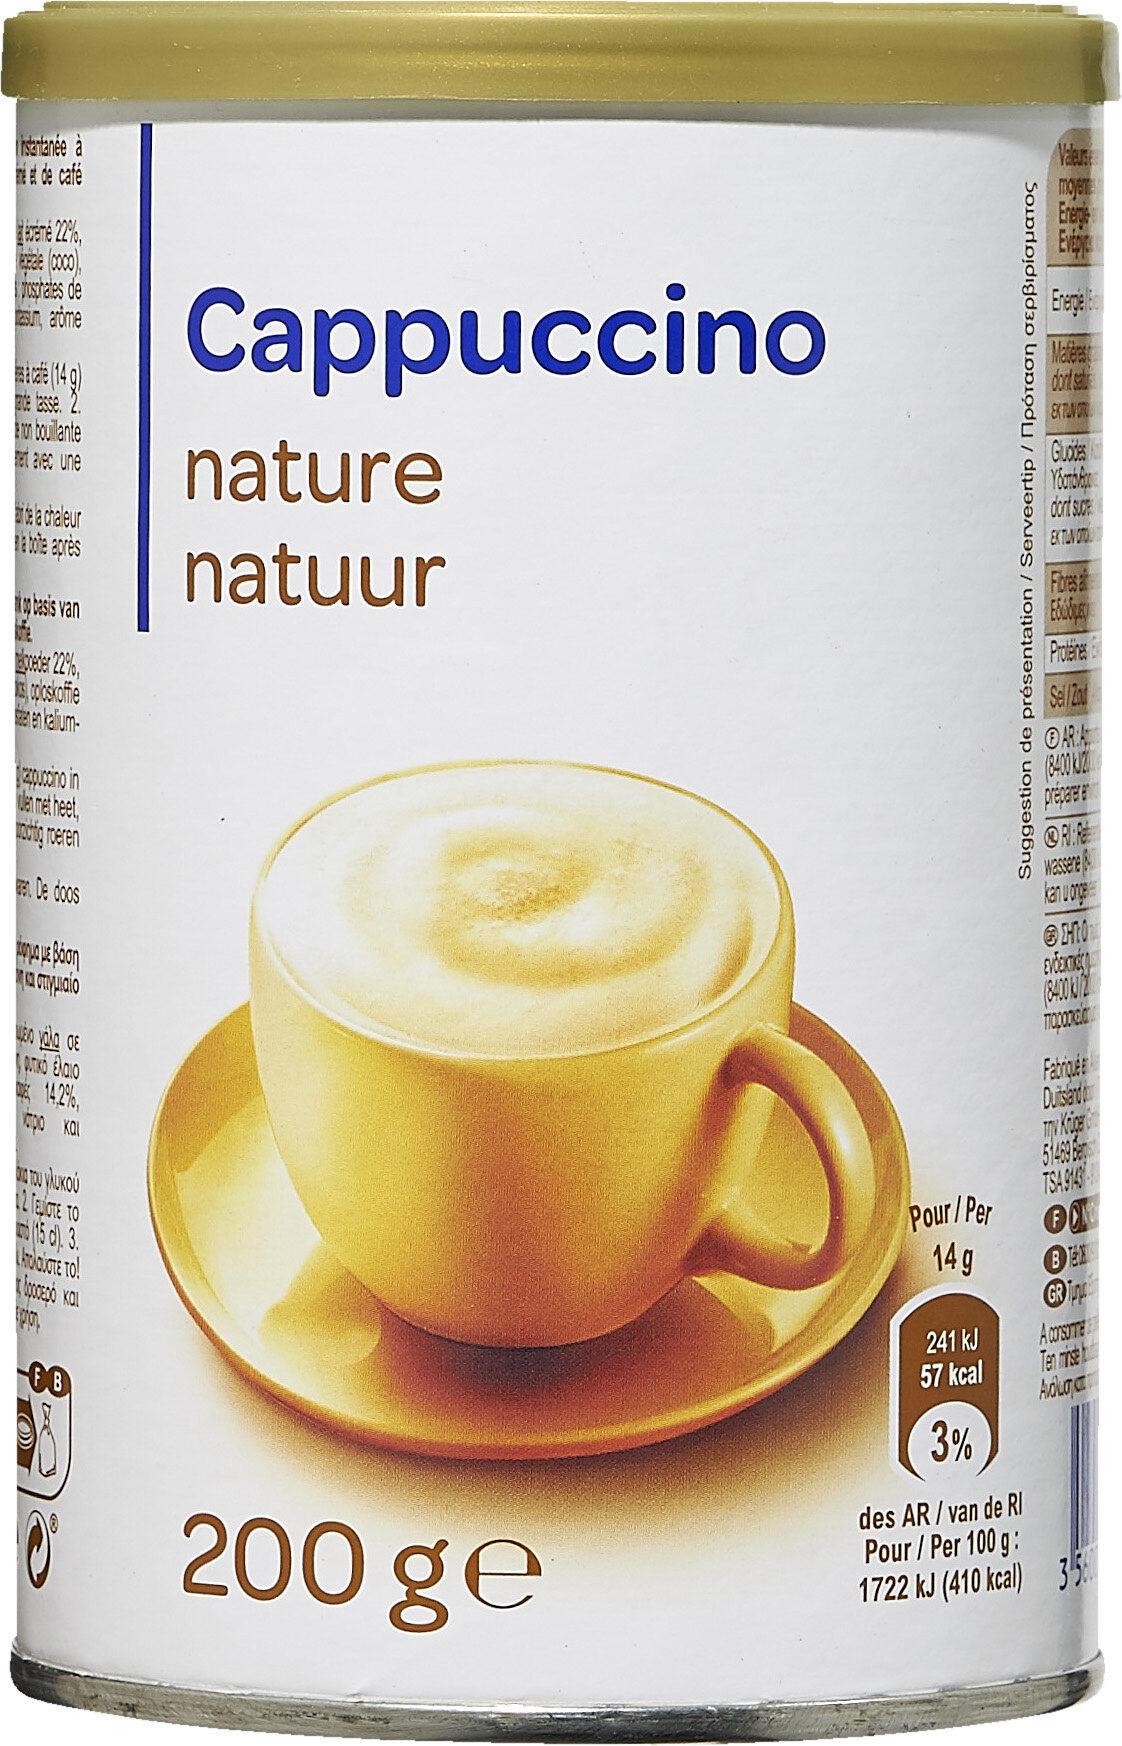 Cappuccino nature - Produit - fr